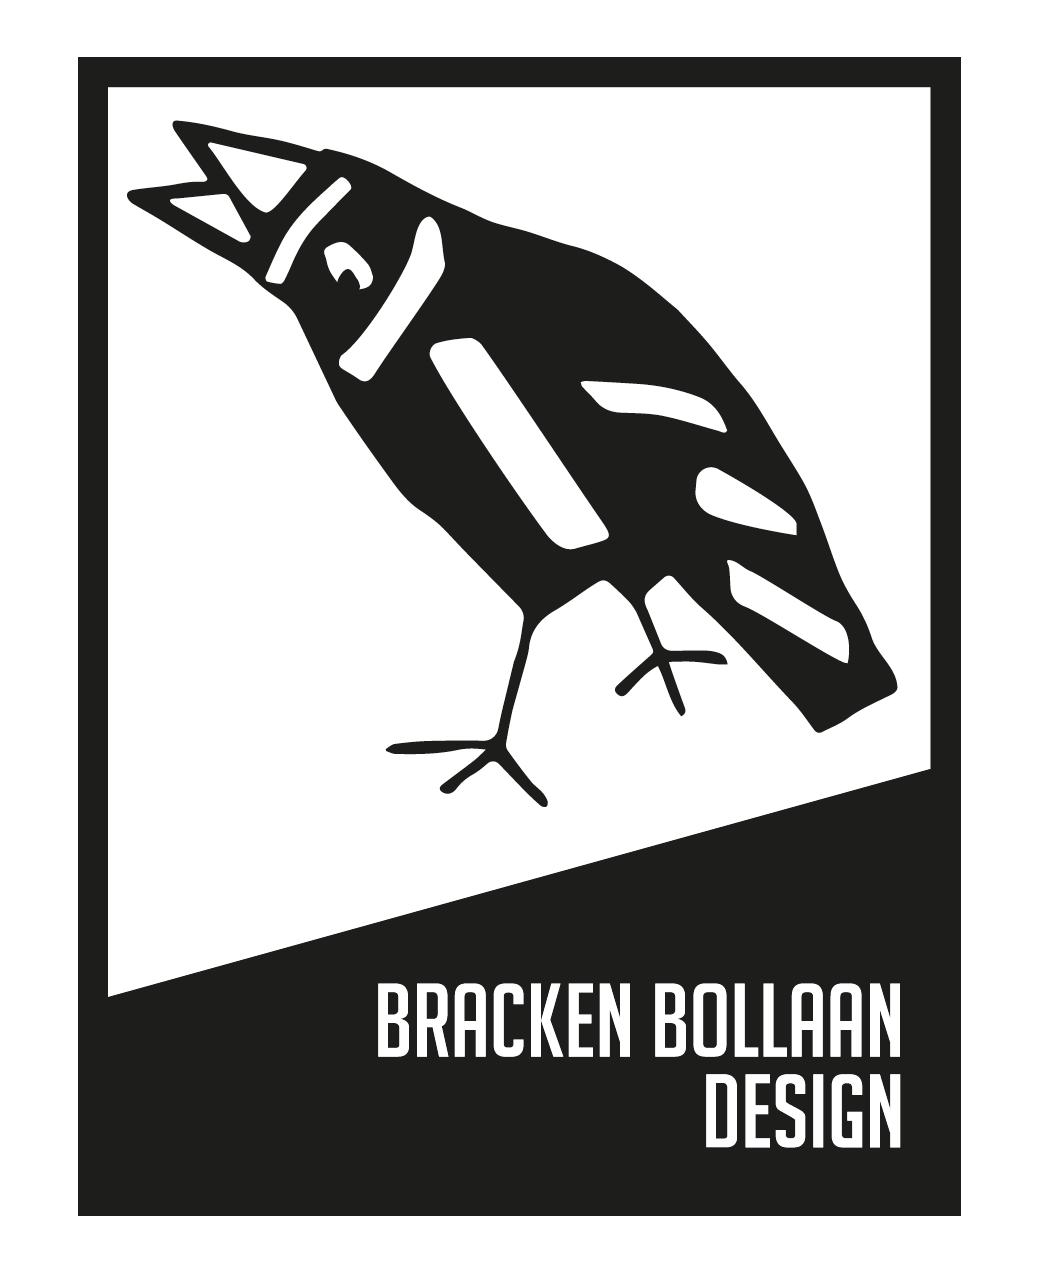 Bracken Bollaan